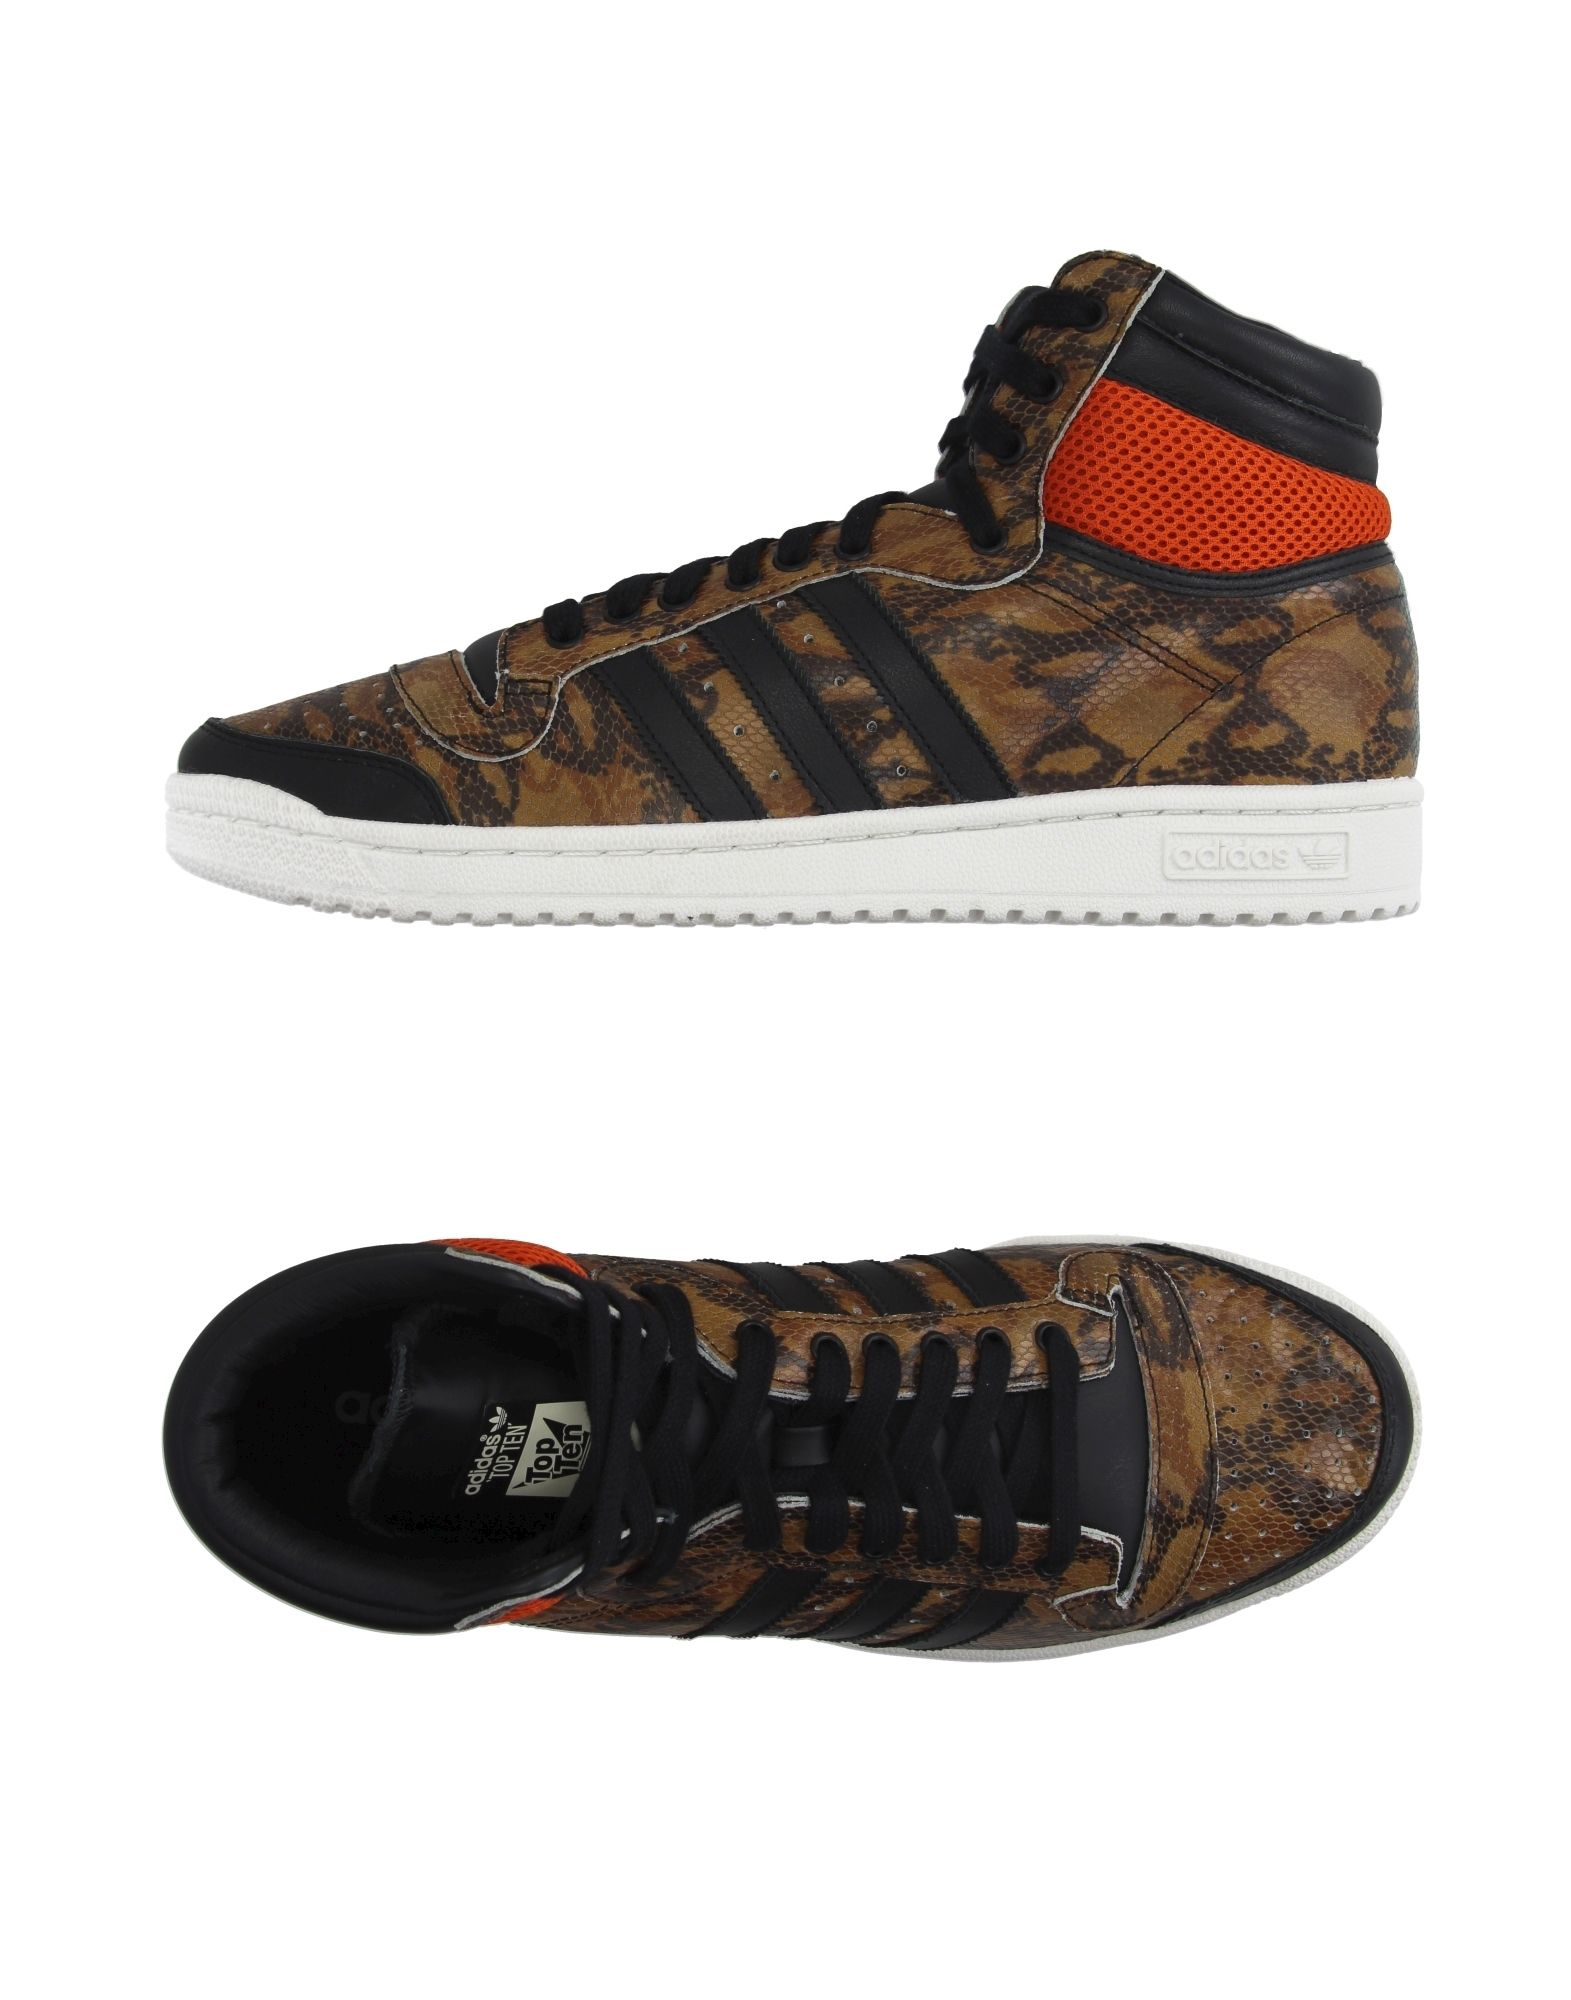 Sneakers Adidas Originals Uomo - 11011954PK